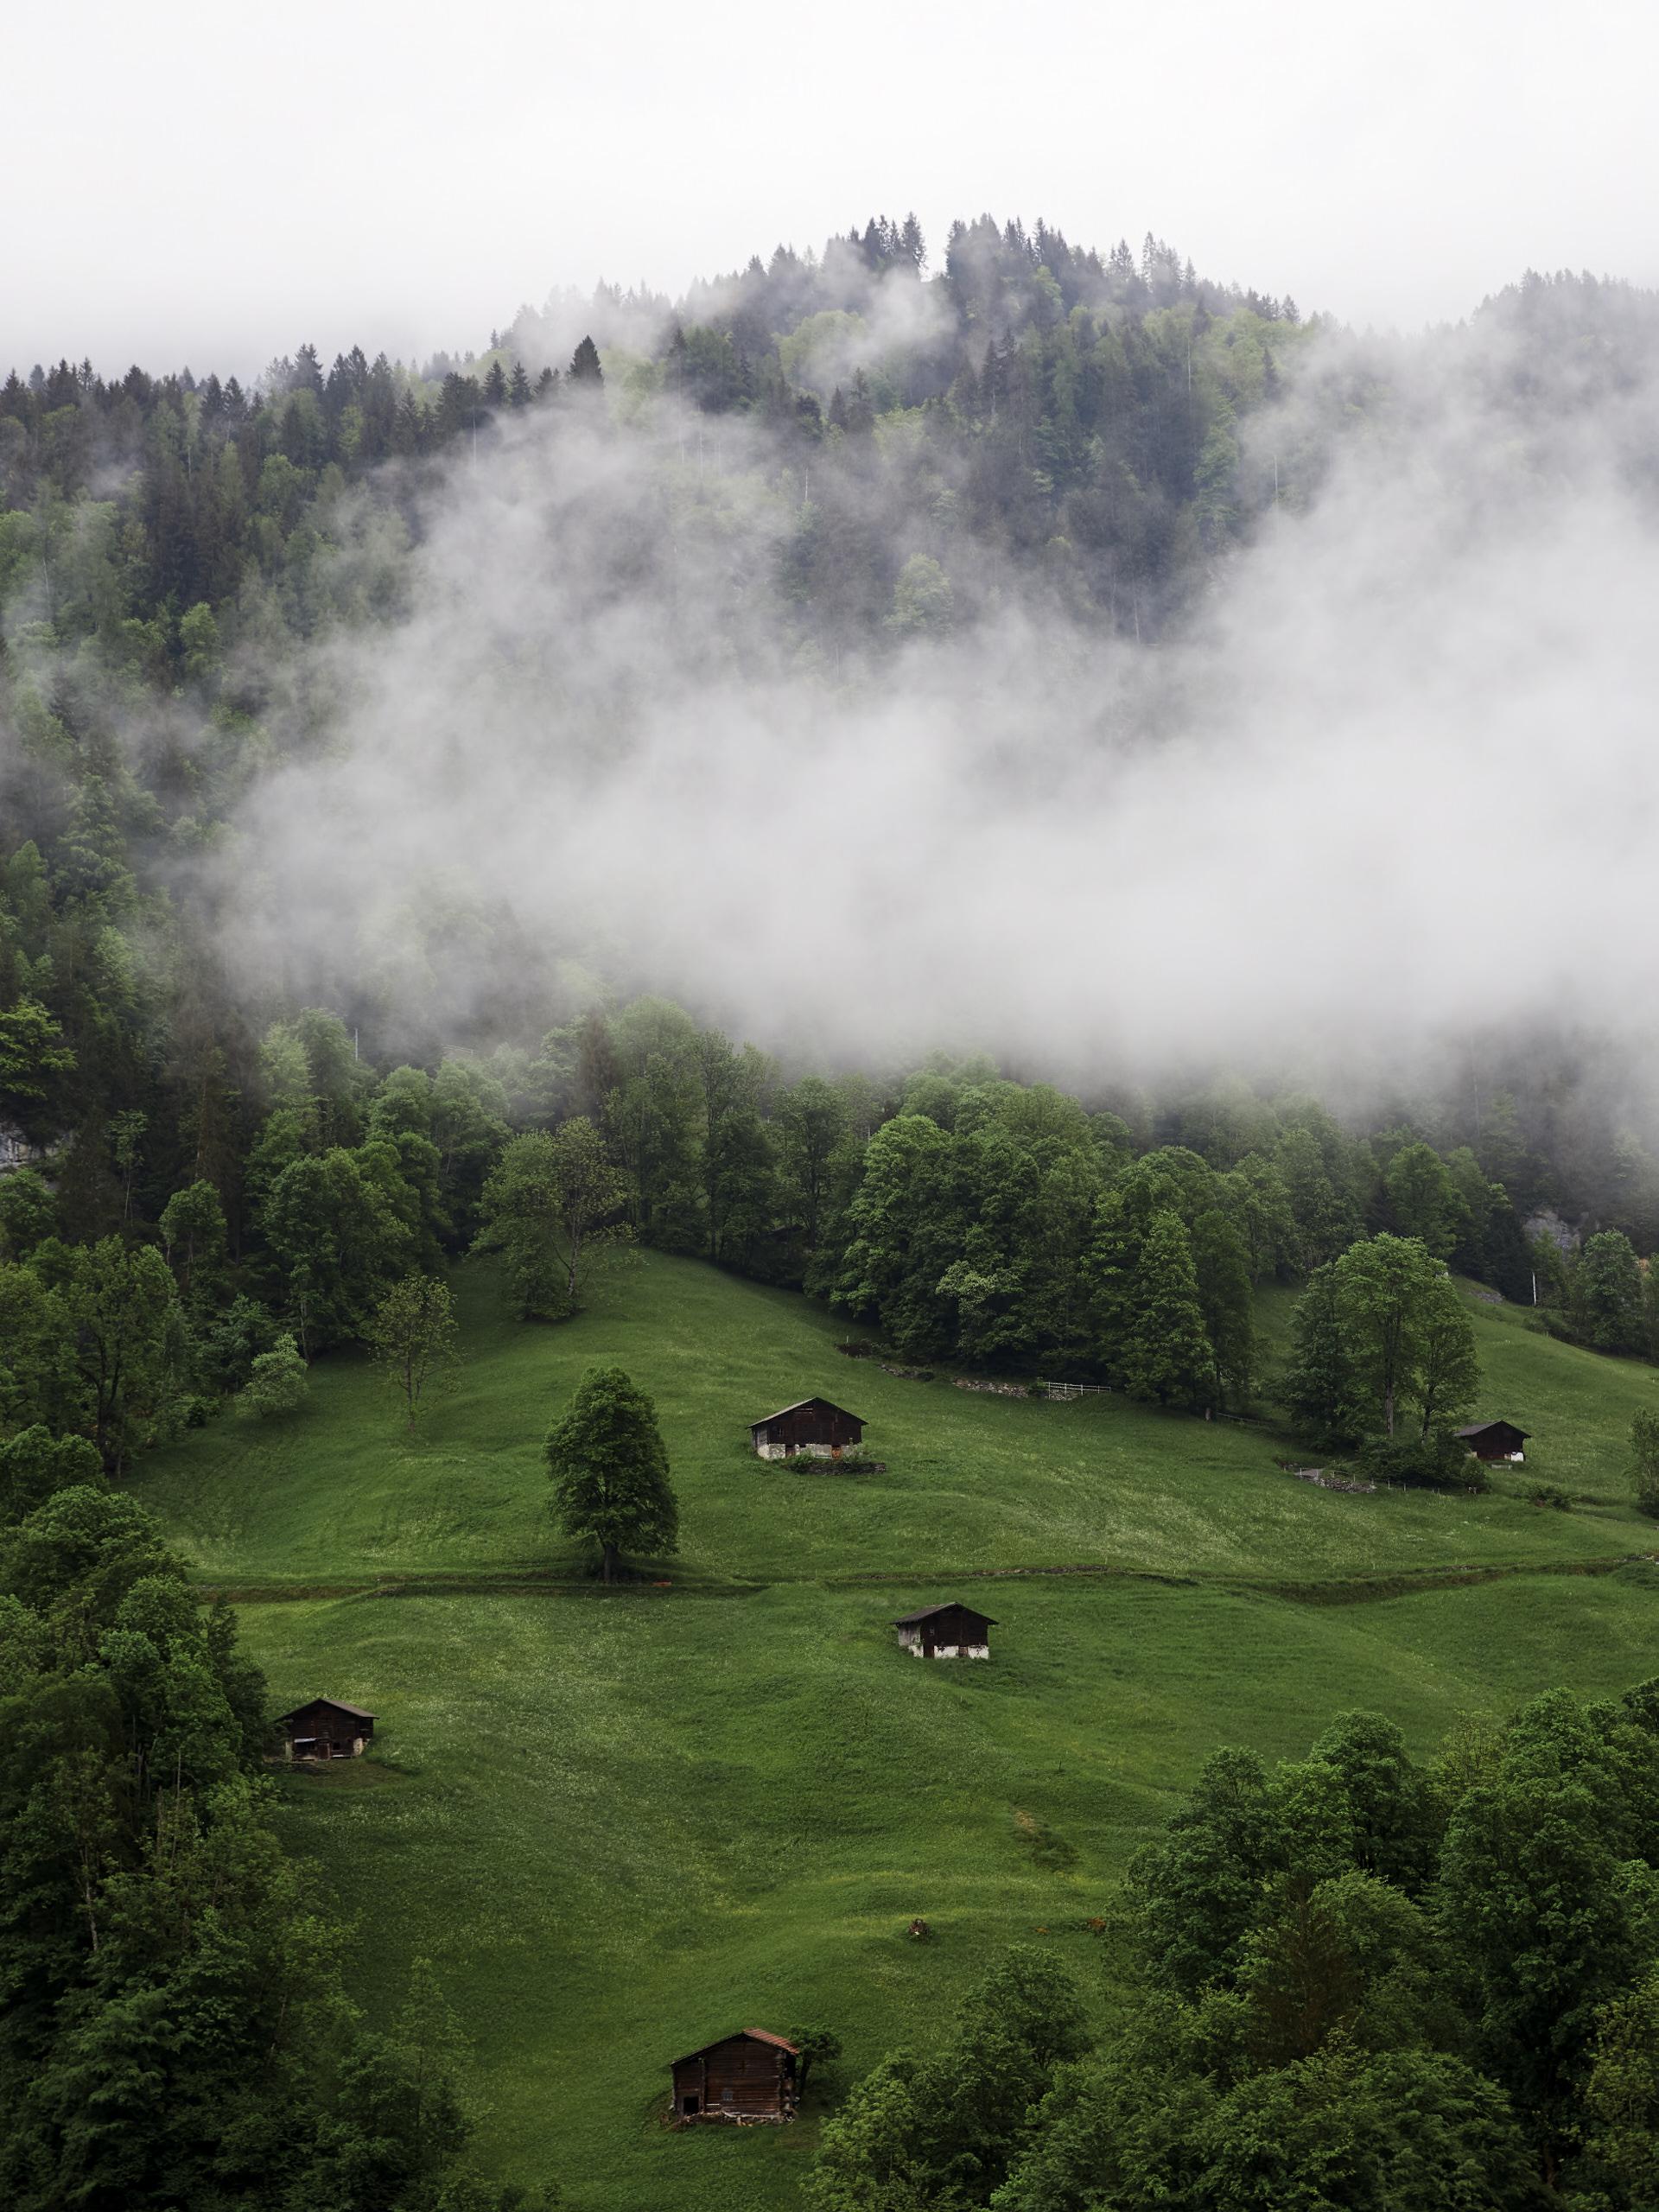 SWITZERLAND - LODESTARS ANTHOLOGY  COMING SOON